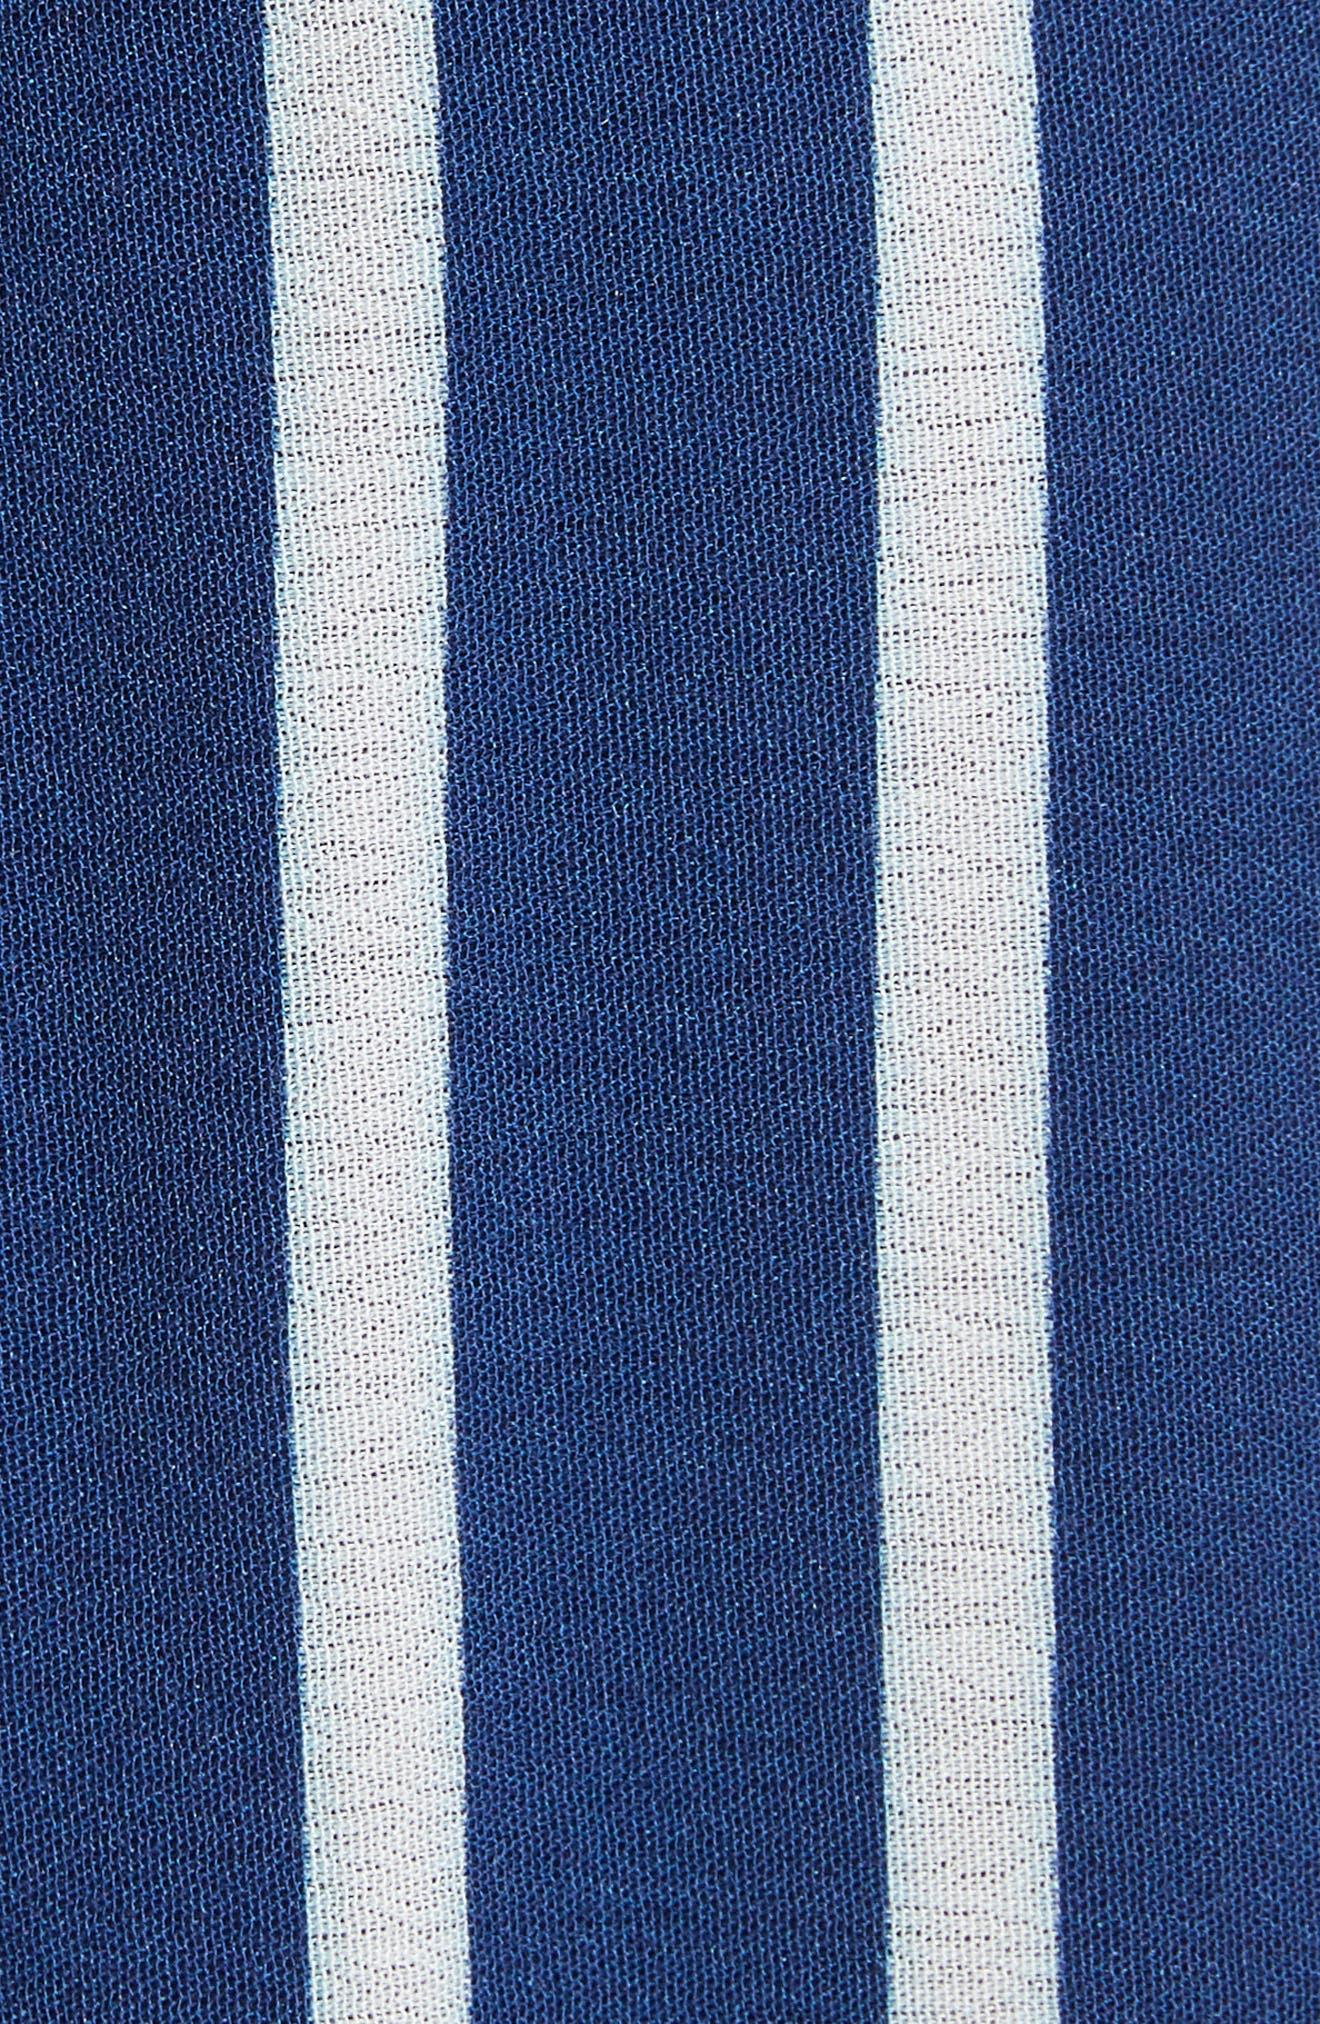 Grazi Off the Shoulder Maxi Dress,                             Alternate thumbnail 5, color,                             Oasis Stripe